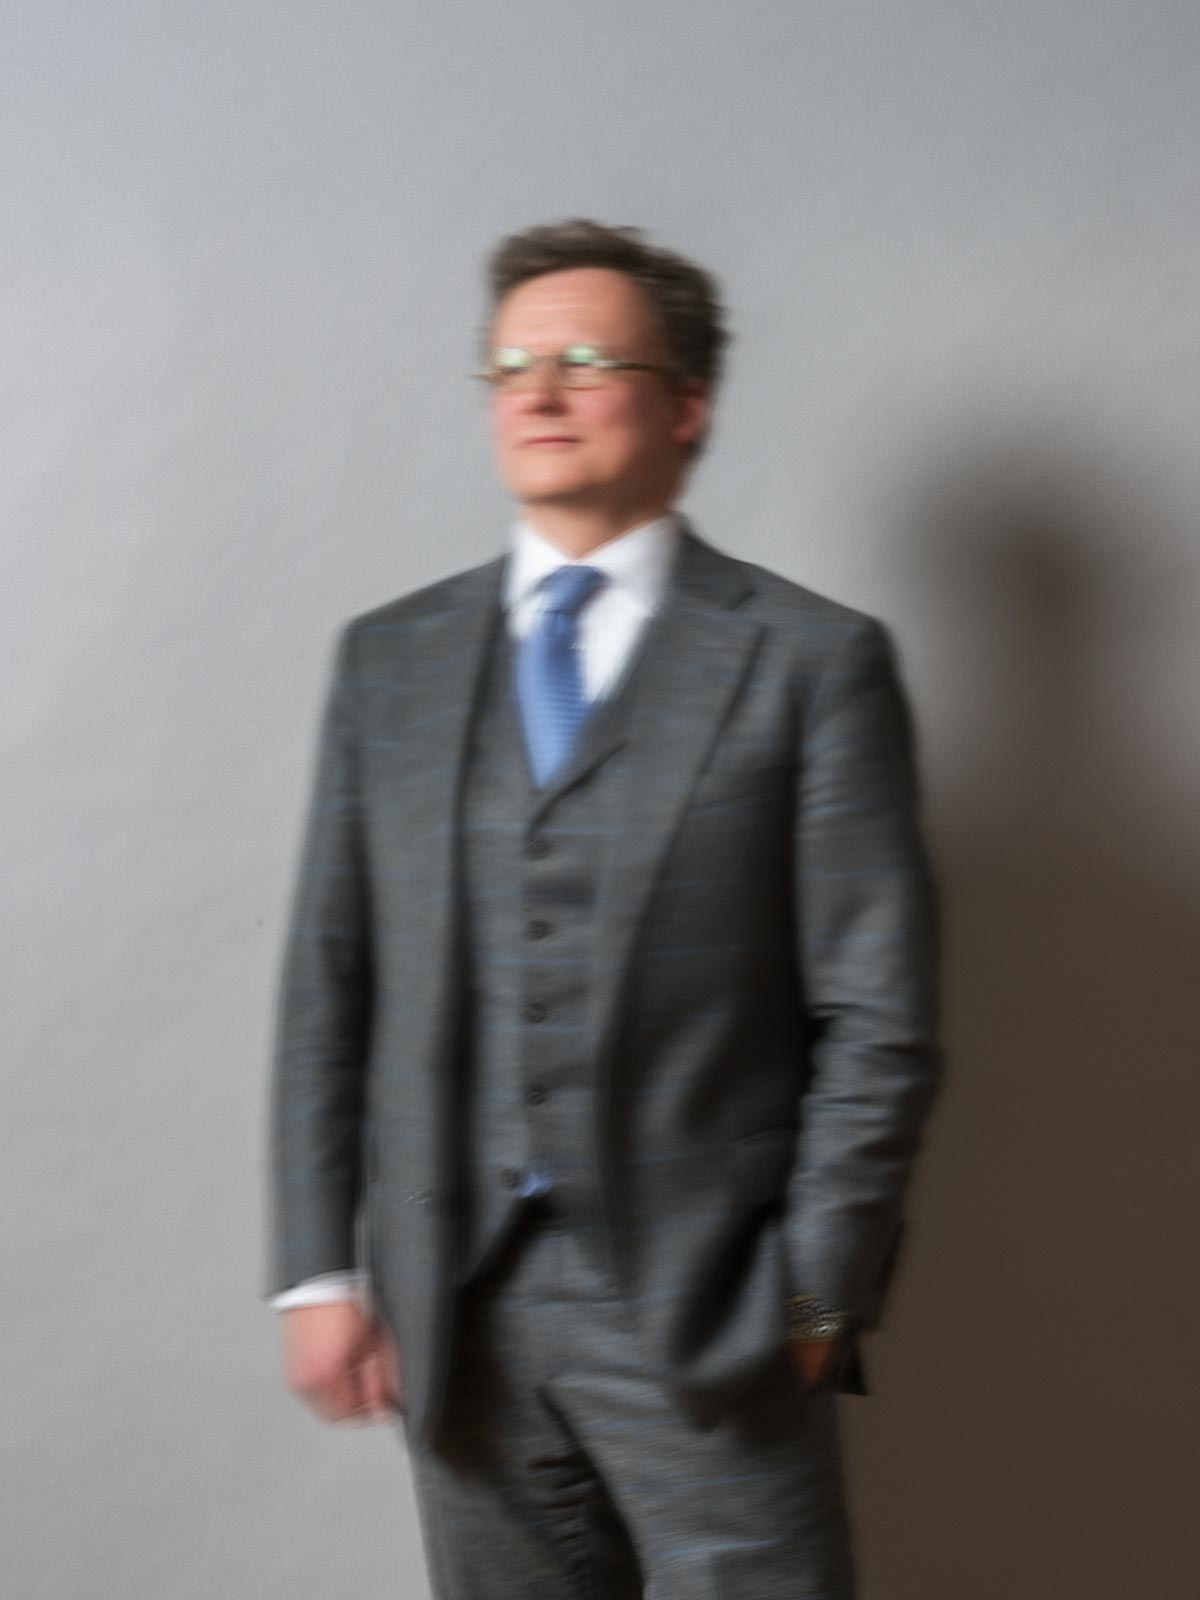 Christoph Seibt (19.06 - 19.11 Uhr, 18.2.2015)